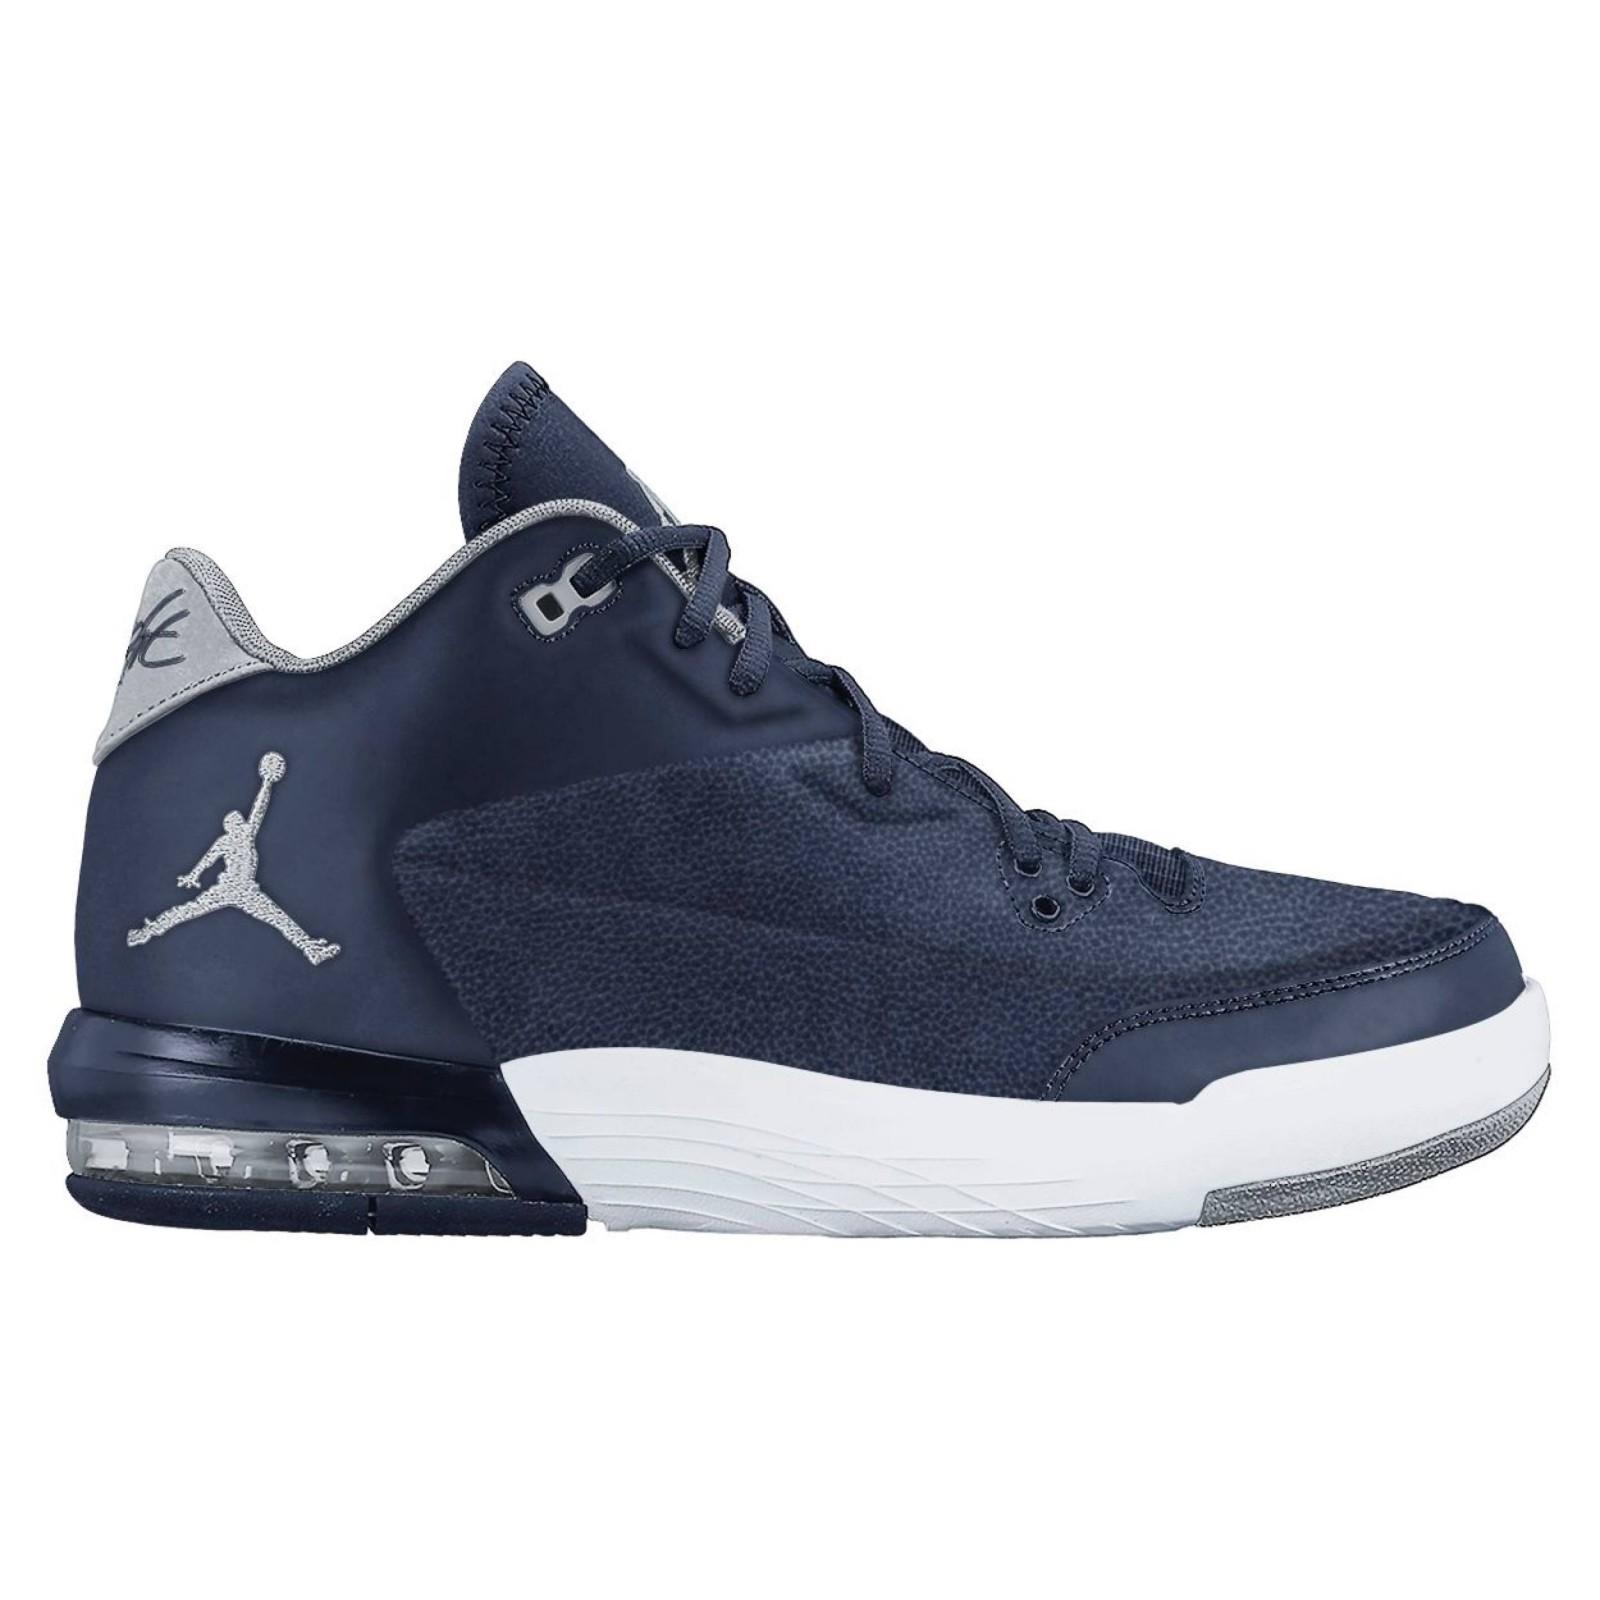 87114ceda6a Pánské boty Jordan FLIGHT ORIGIN 3